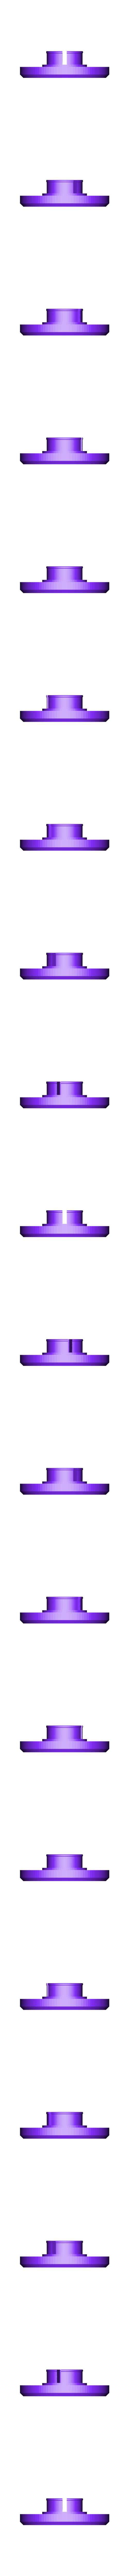 spinner_cap_4-30-2017.stl Download free STL file The Taller Last spinner cap • 3D printable design, Inspyre3d